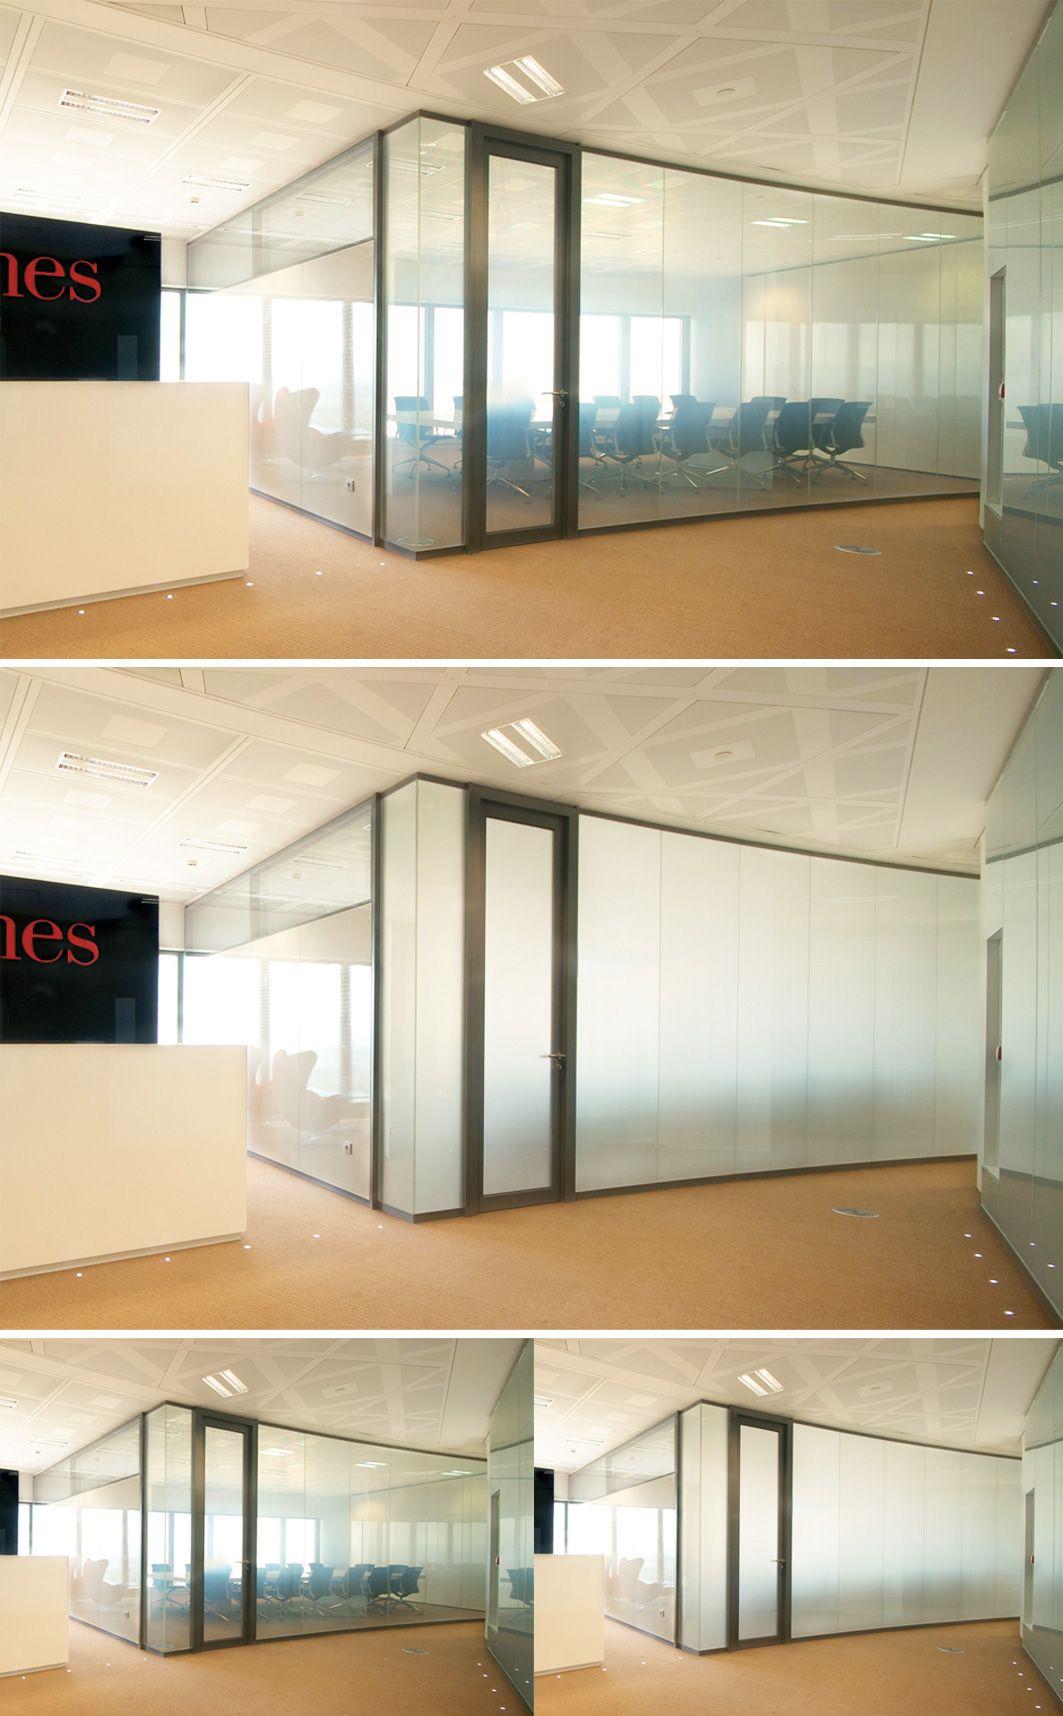 Privacy glass solution for high tech interior partitioning for Espacio interior